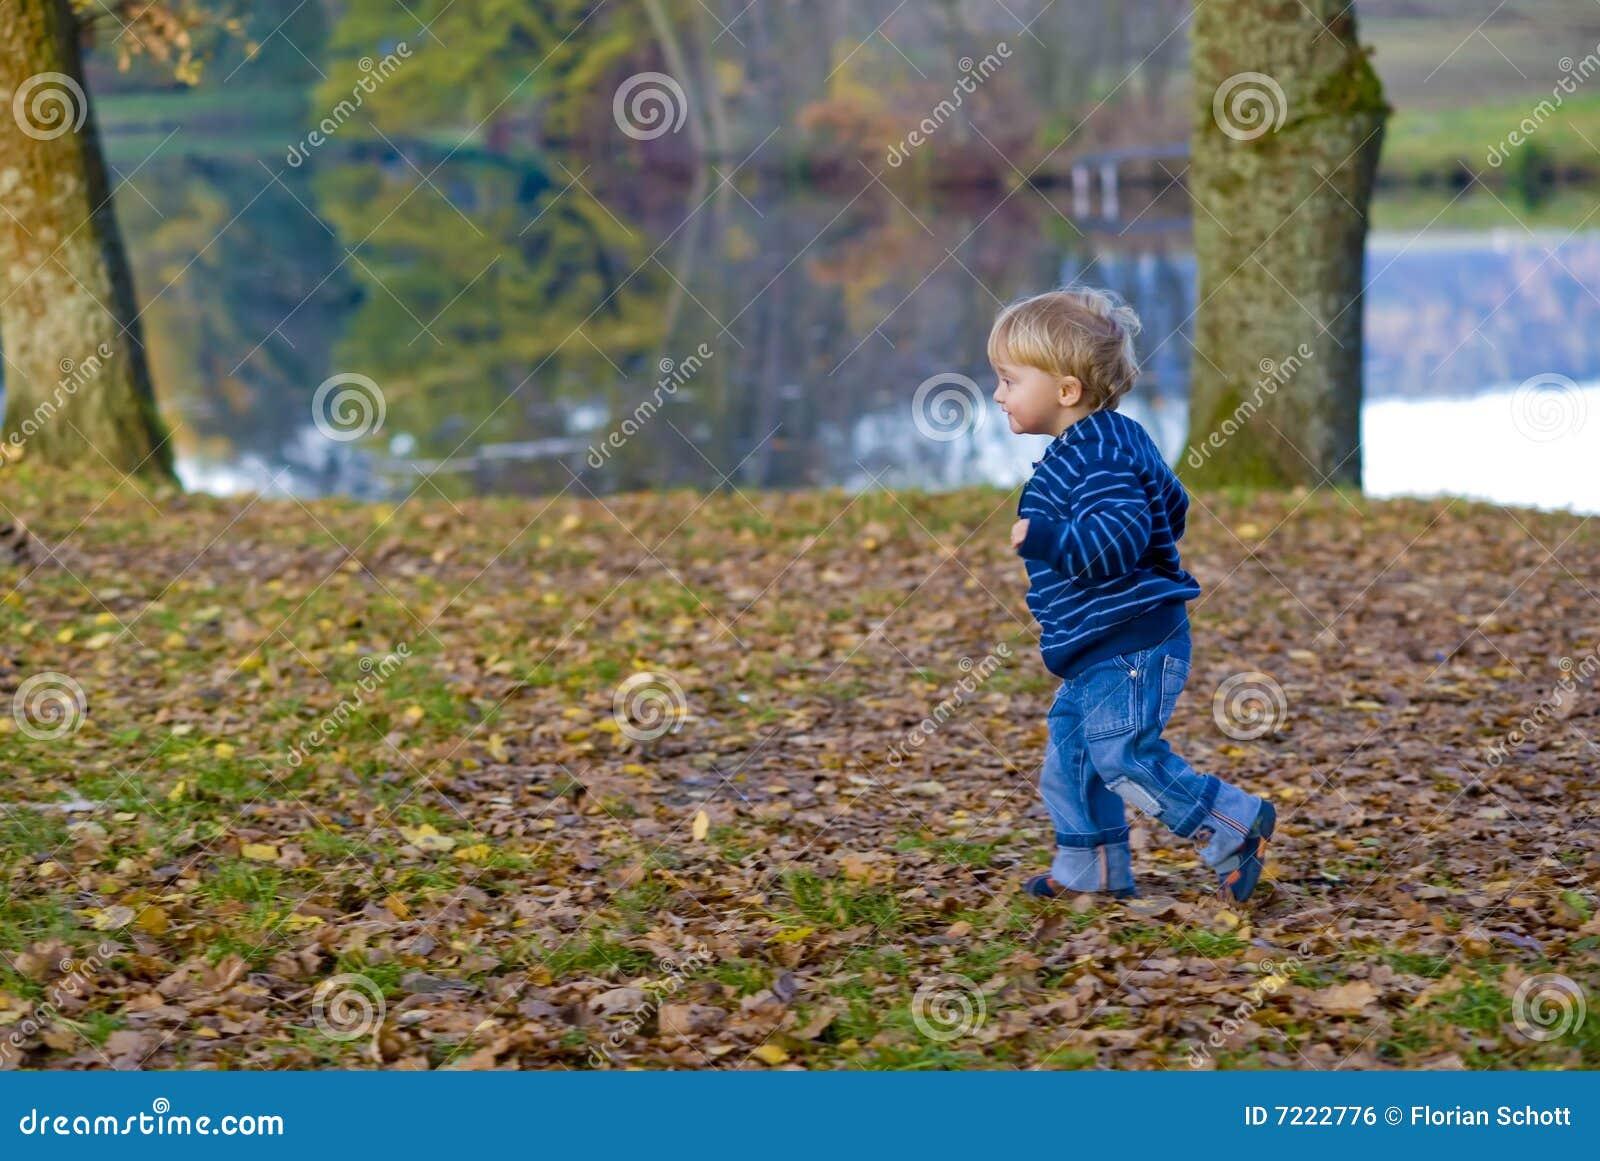 ход ребенка